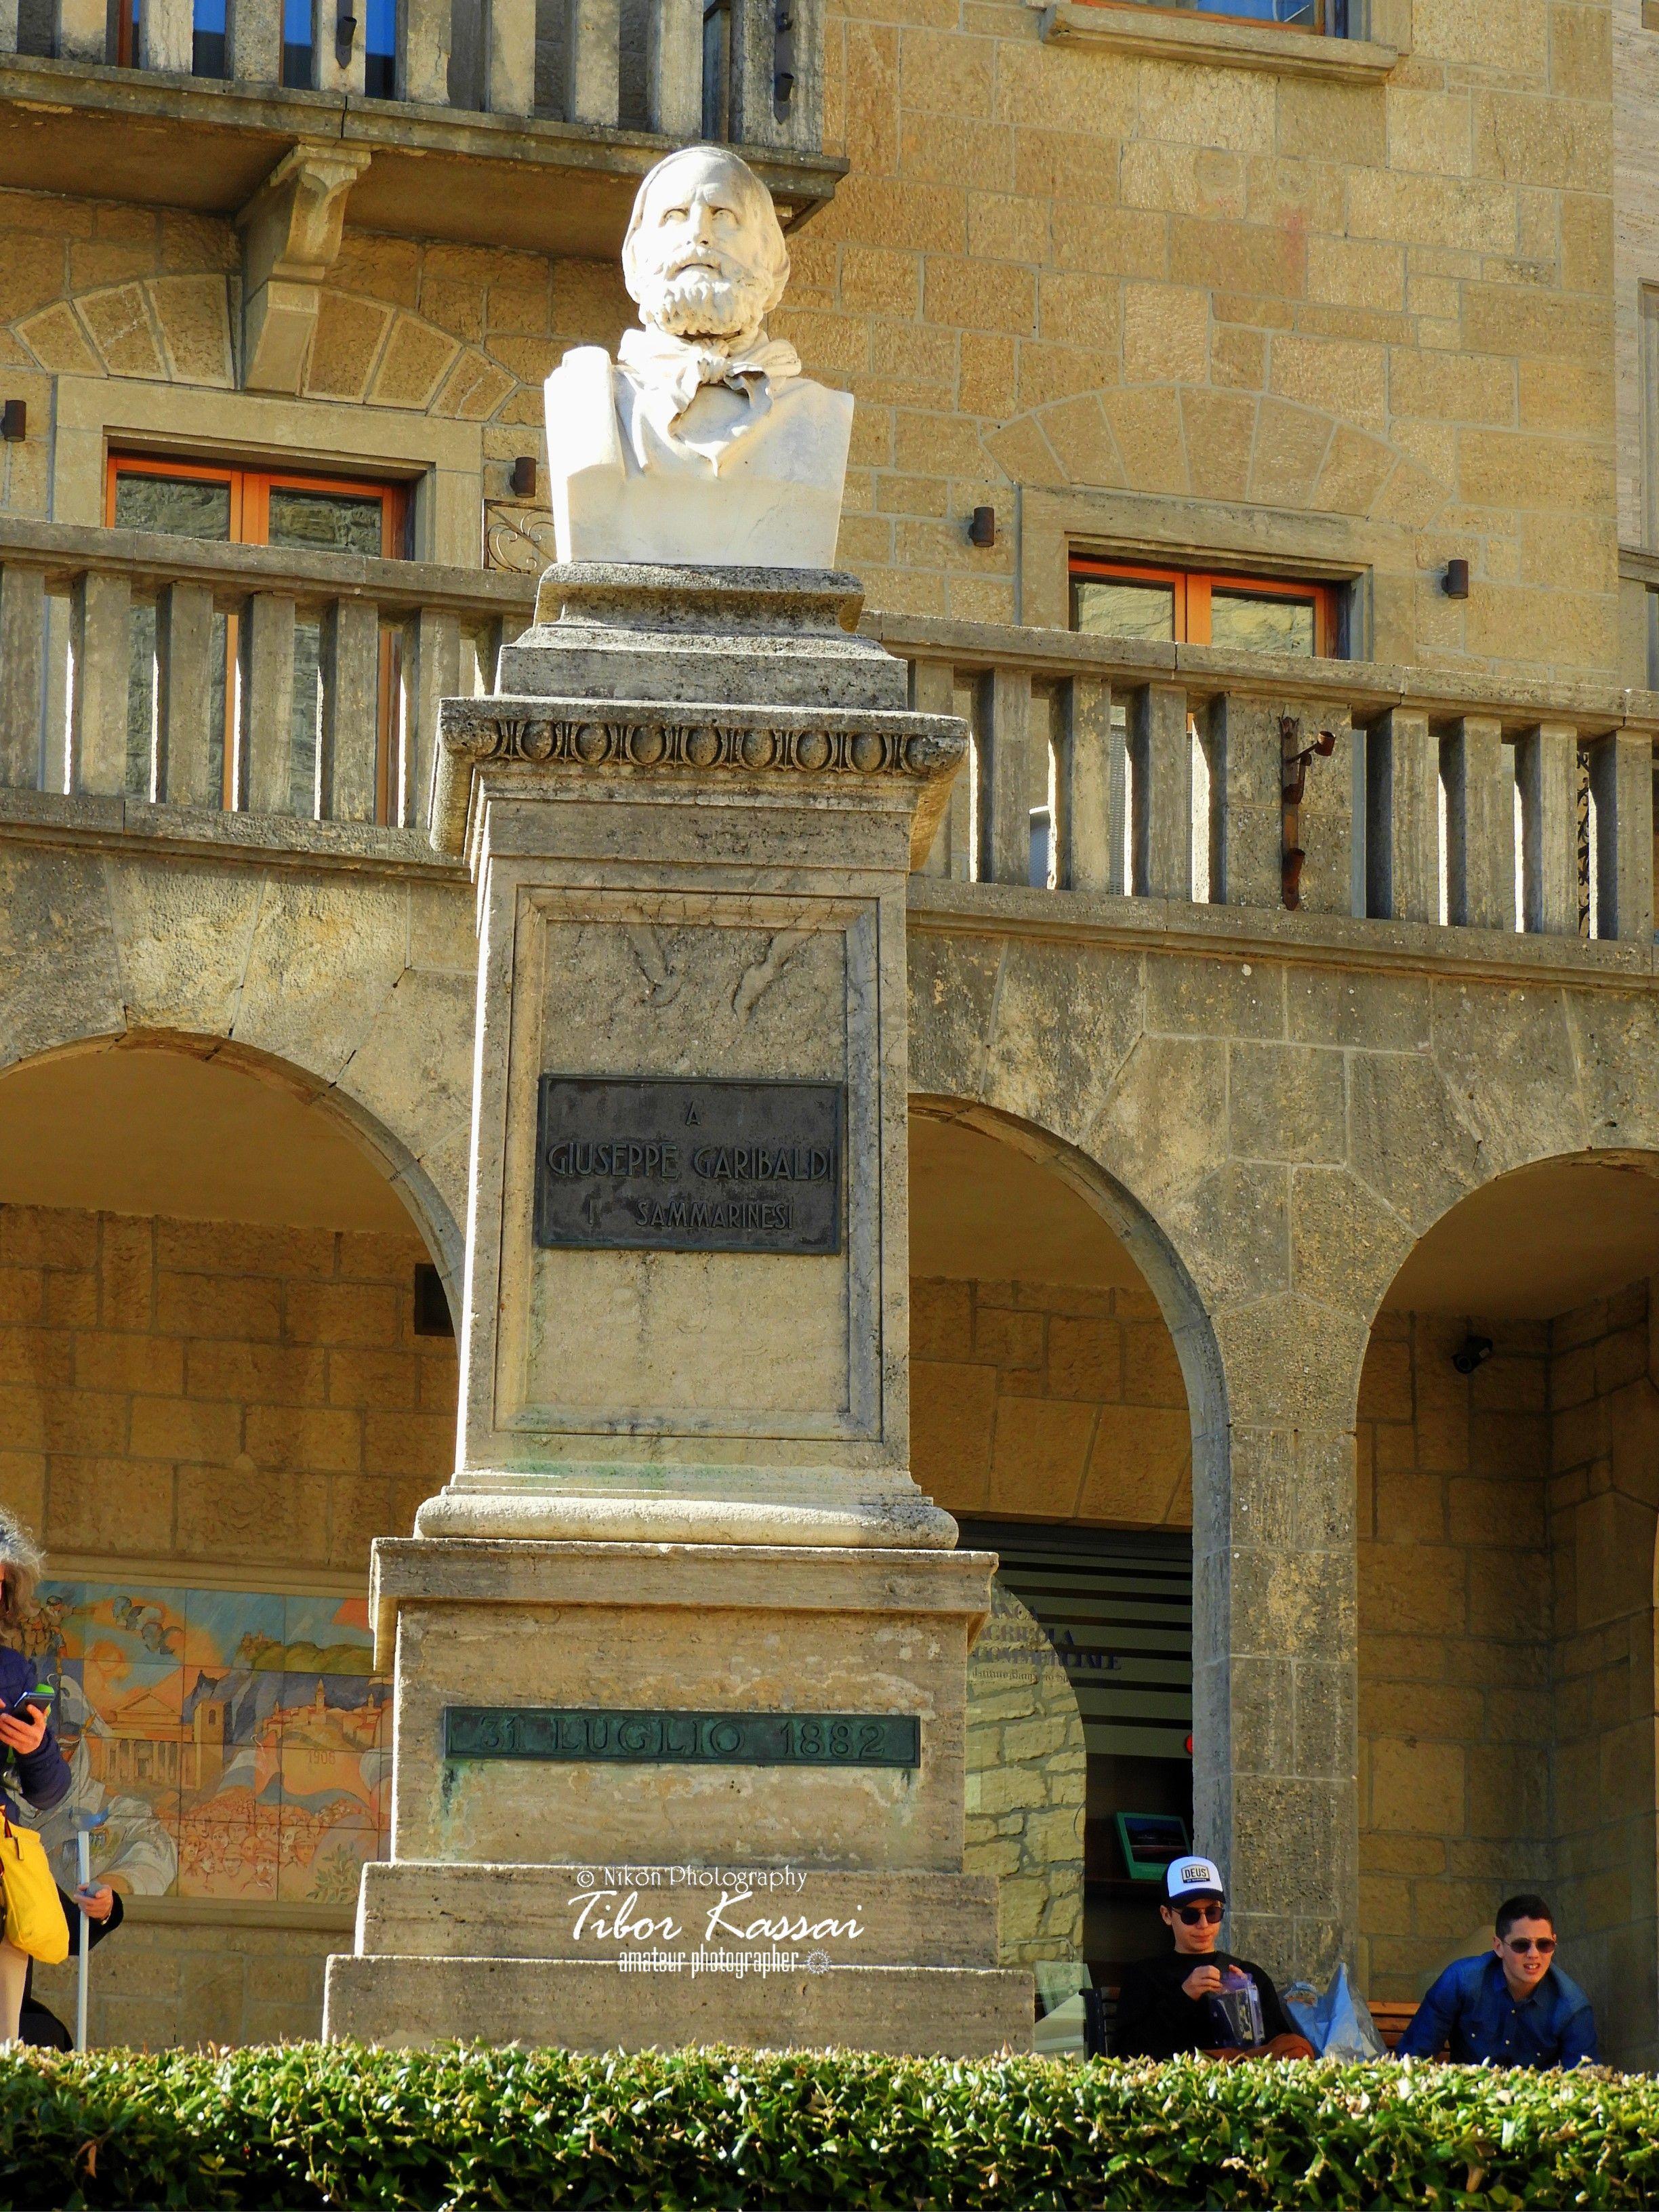 Statue Giuseppe Garibaldi In San Marino City Republic Of San Marino Nikon Coolpixb700 22 4mm 1 20 Republic Of San Marino Hdr Photography Giuseppe Garibaldi